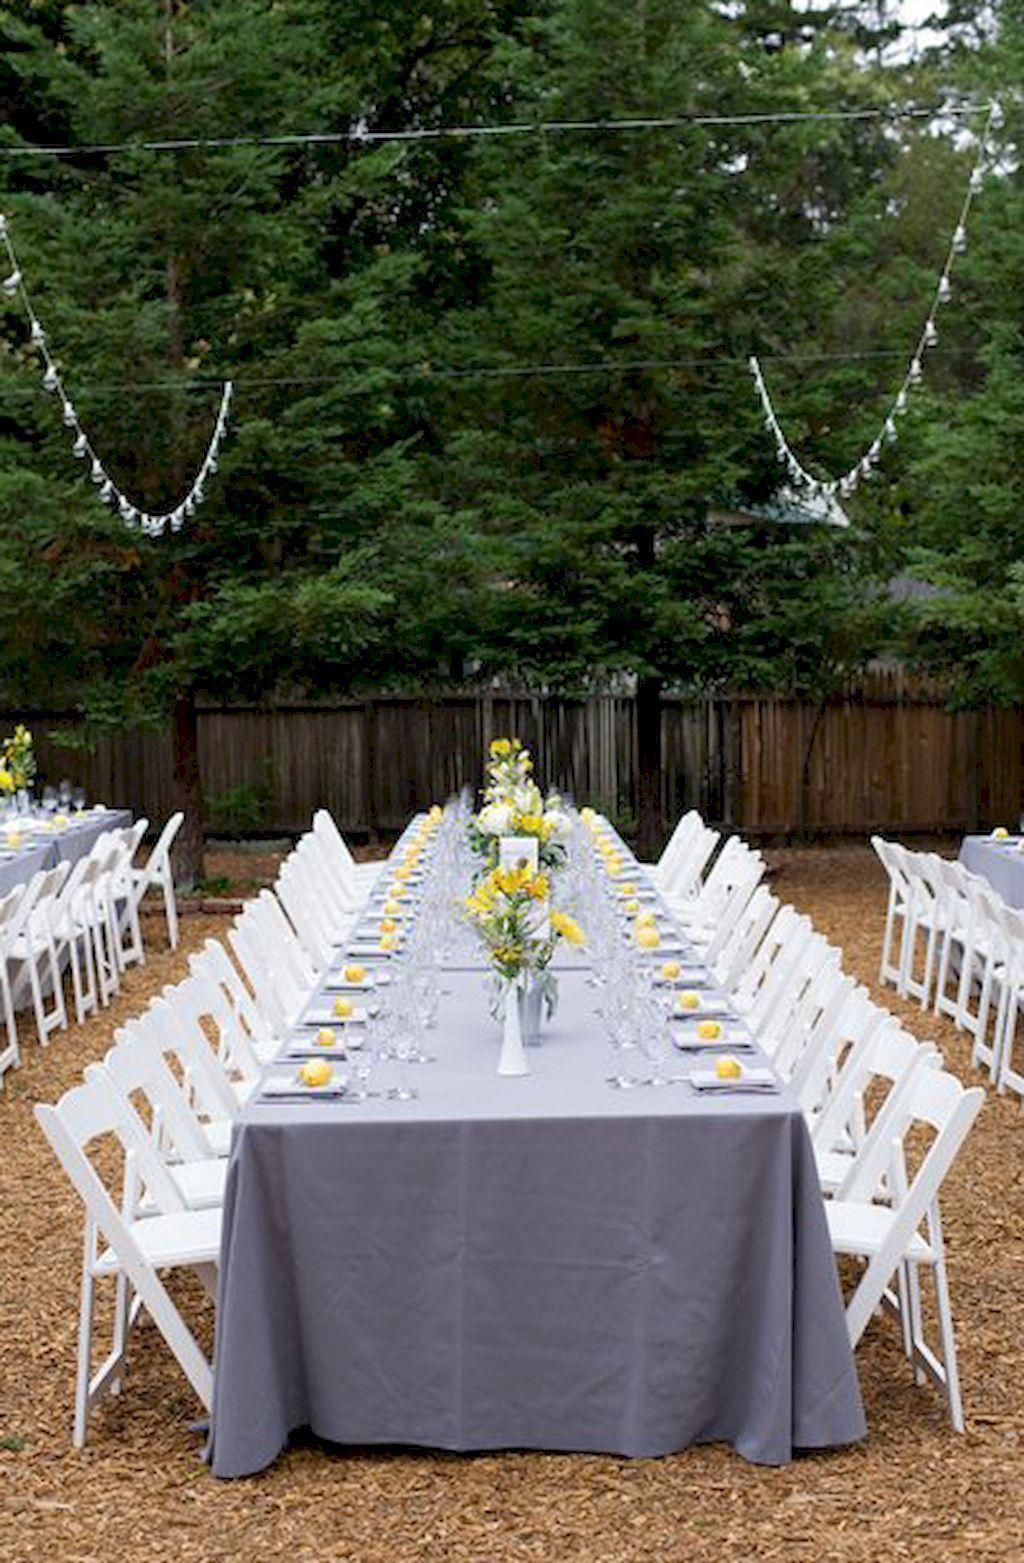 34 Unforgettable Backyard Wedding Ideas for Summer or ...